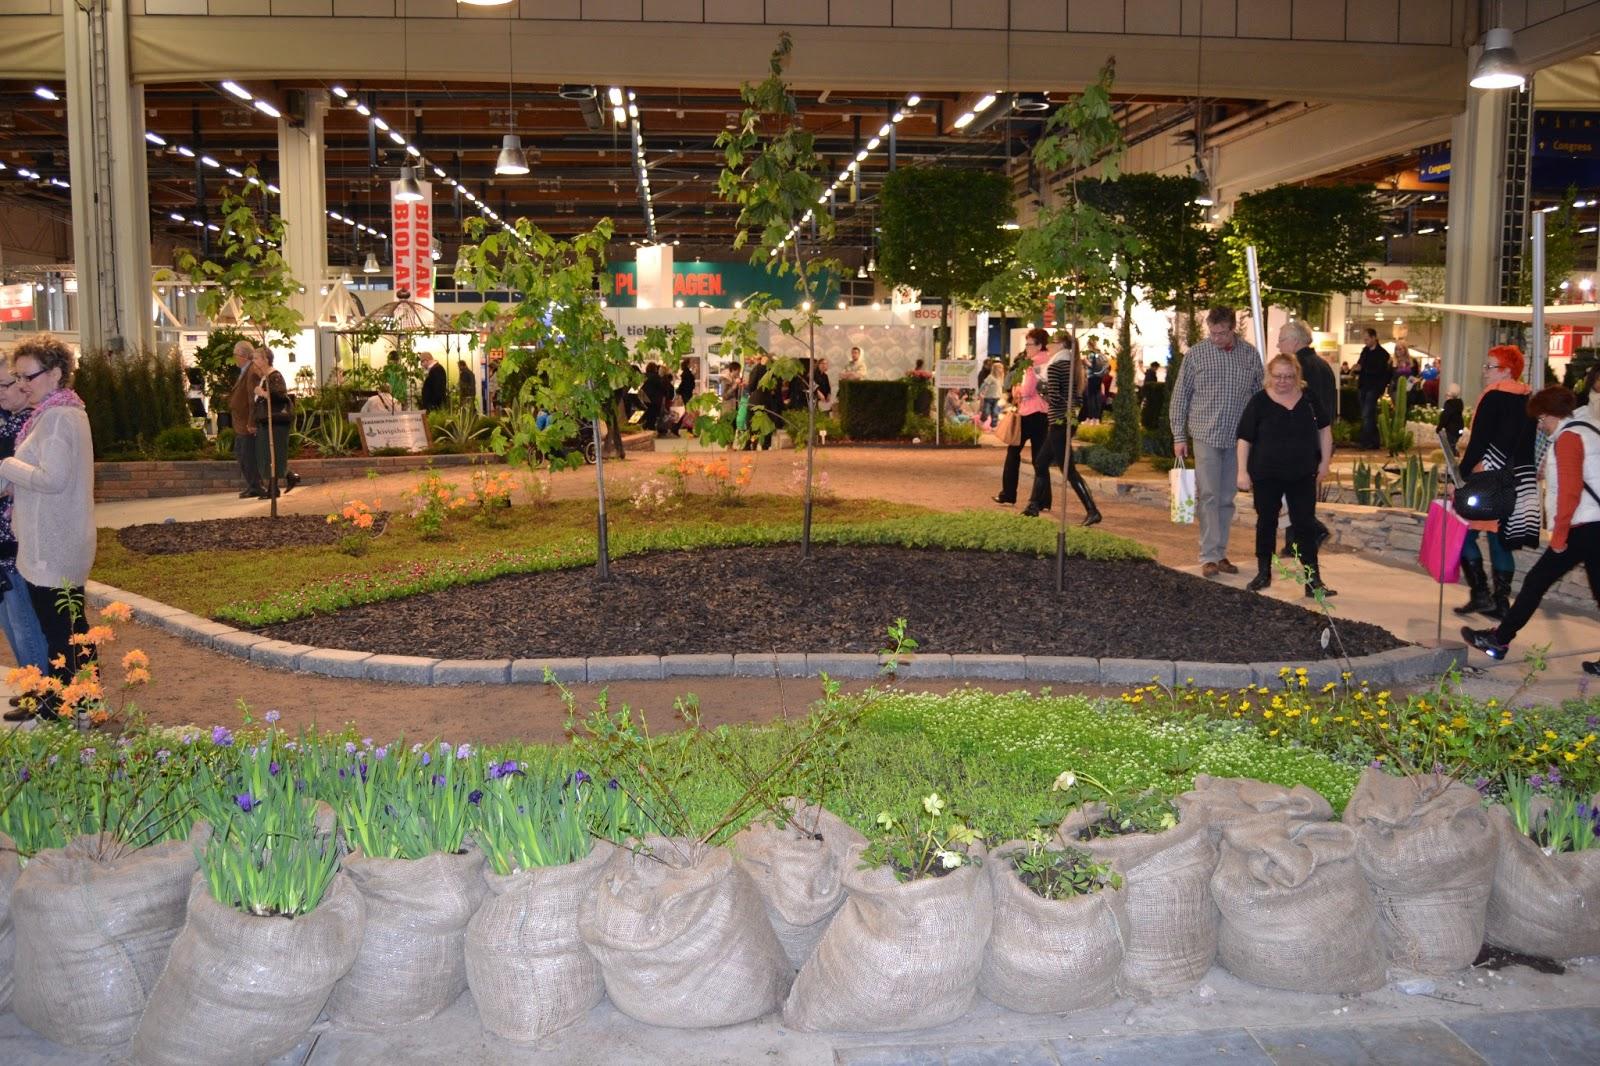 Helsingin puutarhamessut: osa 2 – Helsinki Garden Fair: part 2